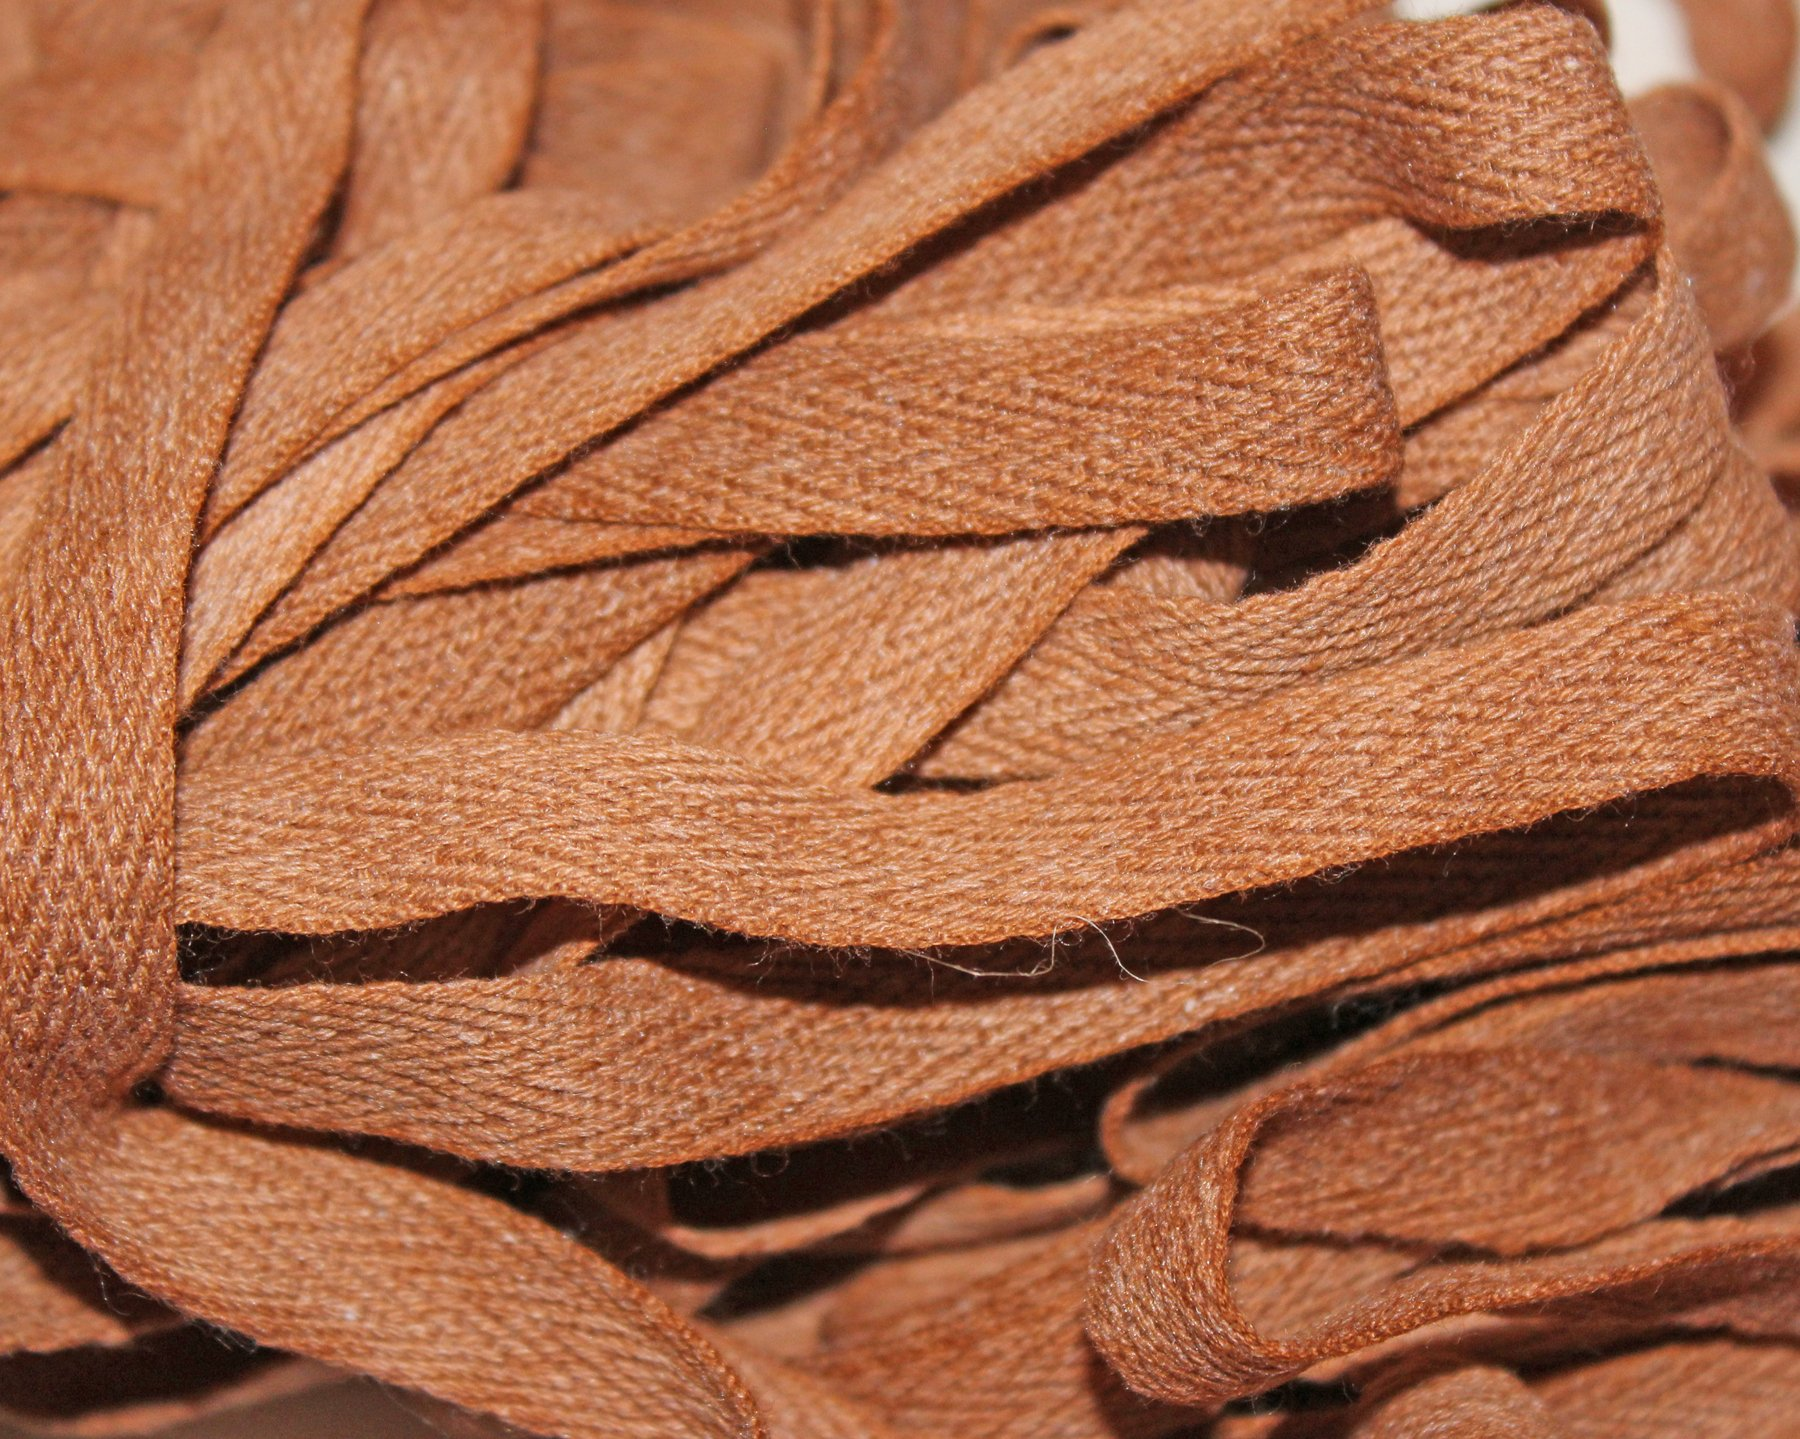 Brick - Hand-dyed Cotton Twill Tape